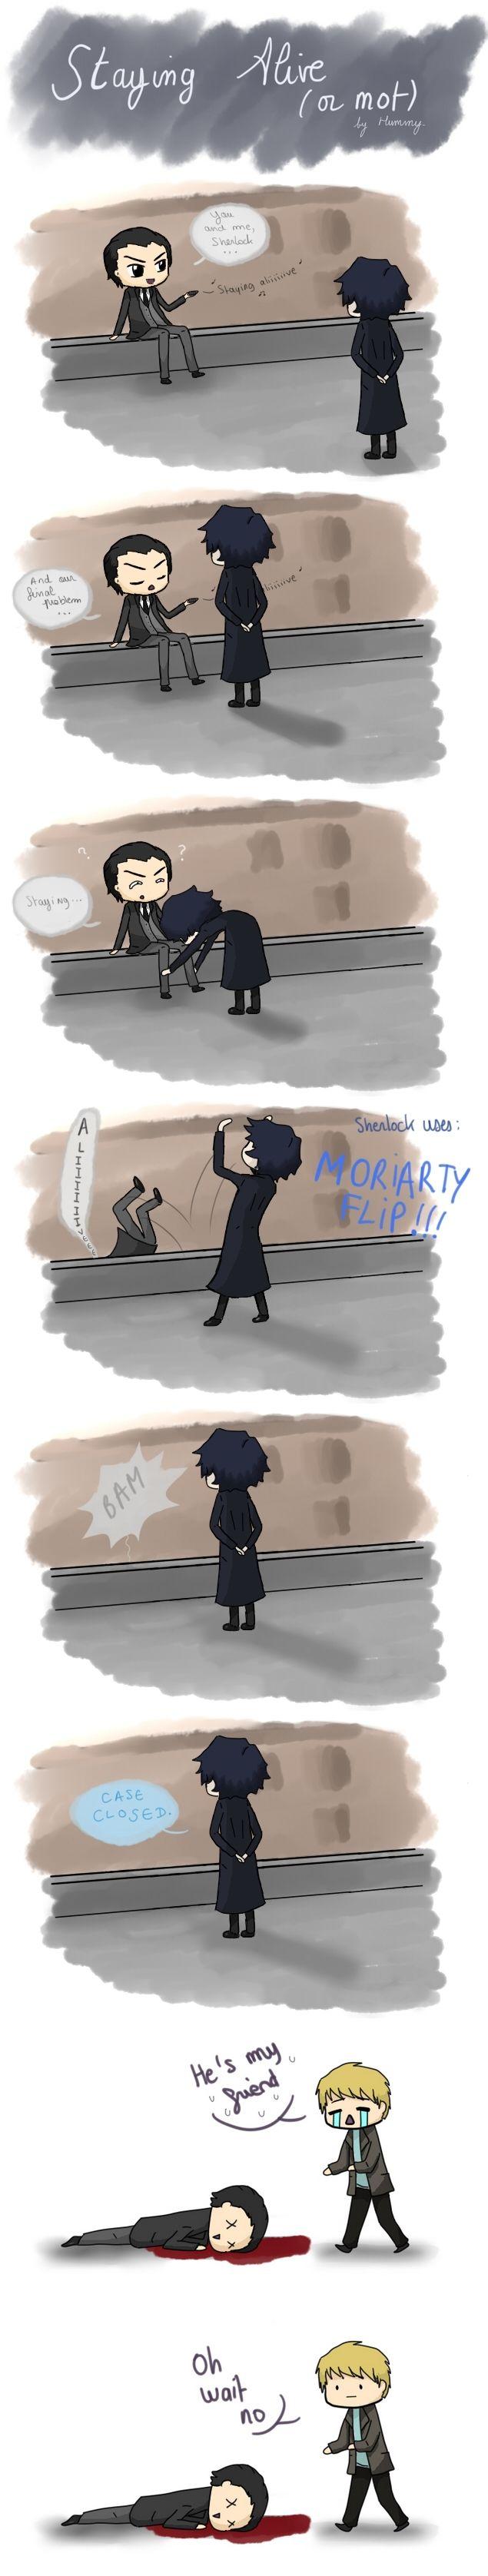 """He's my friend!  Wait, no."" lol.  Oh, dark Reichenbach humor."